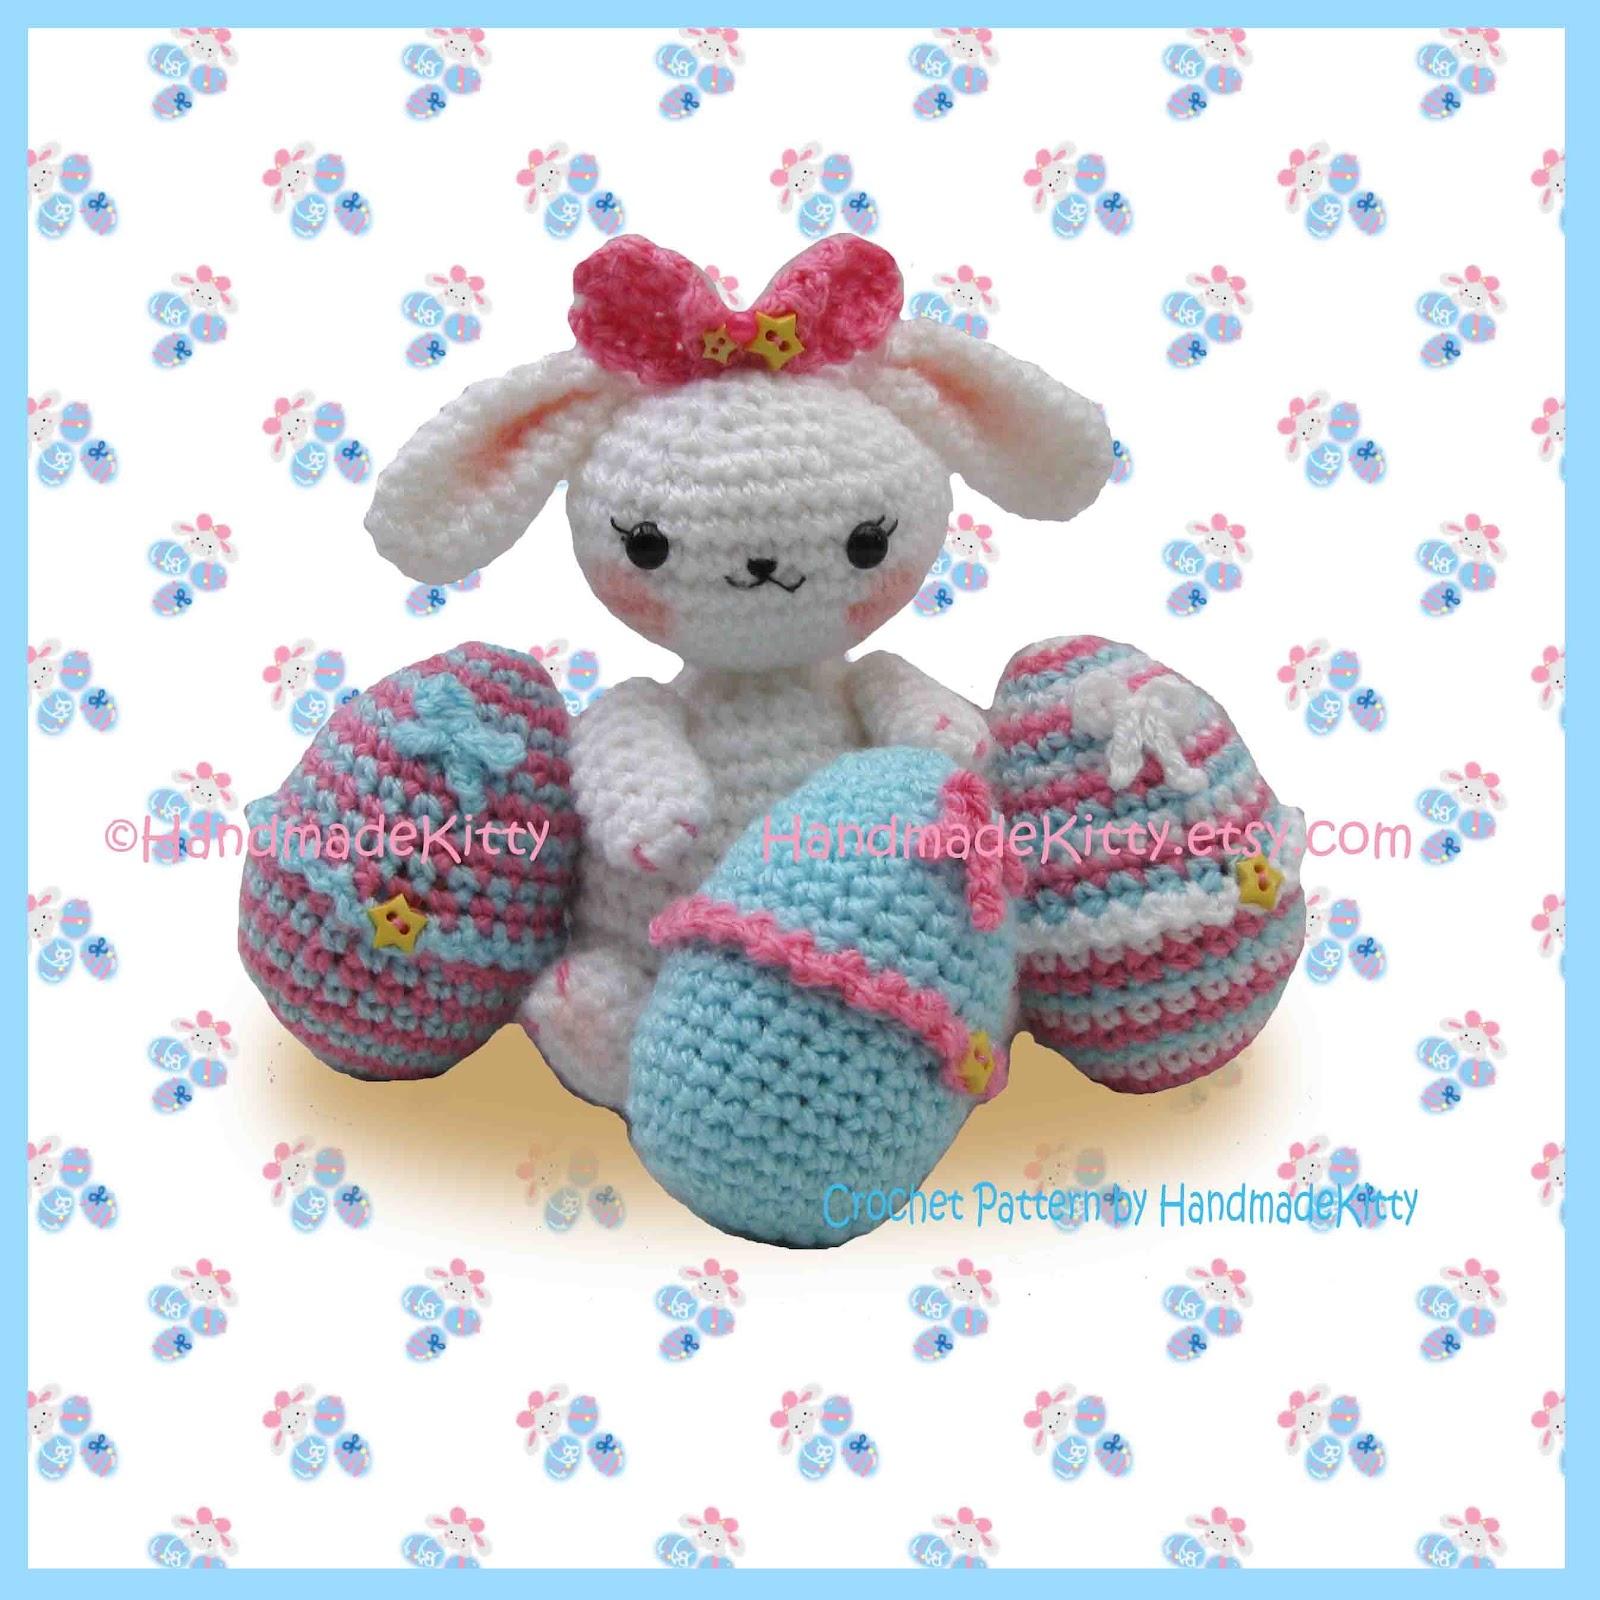 Amigurumi Egg Cozy : HandmadeKitty: Easter Bunny with Cute Egg Cozy Cases ...